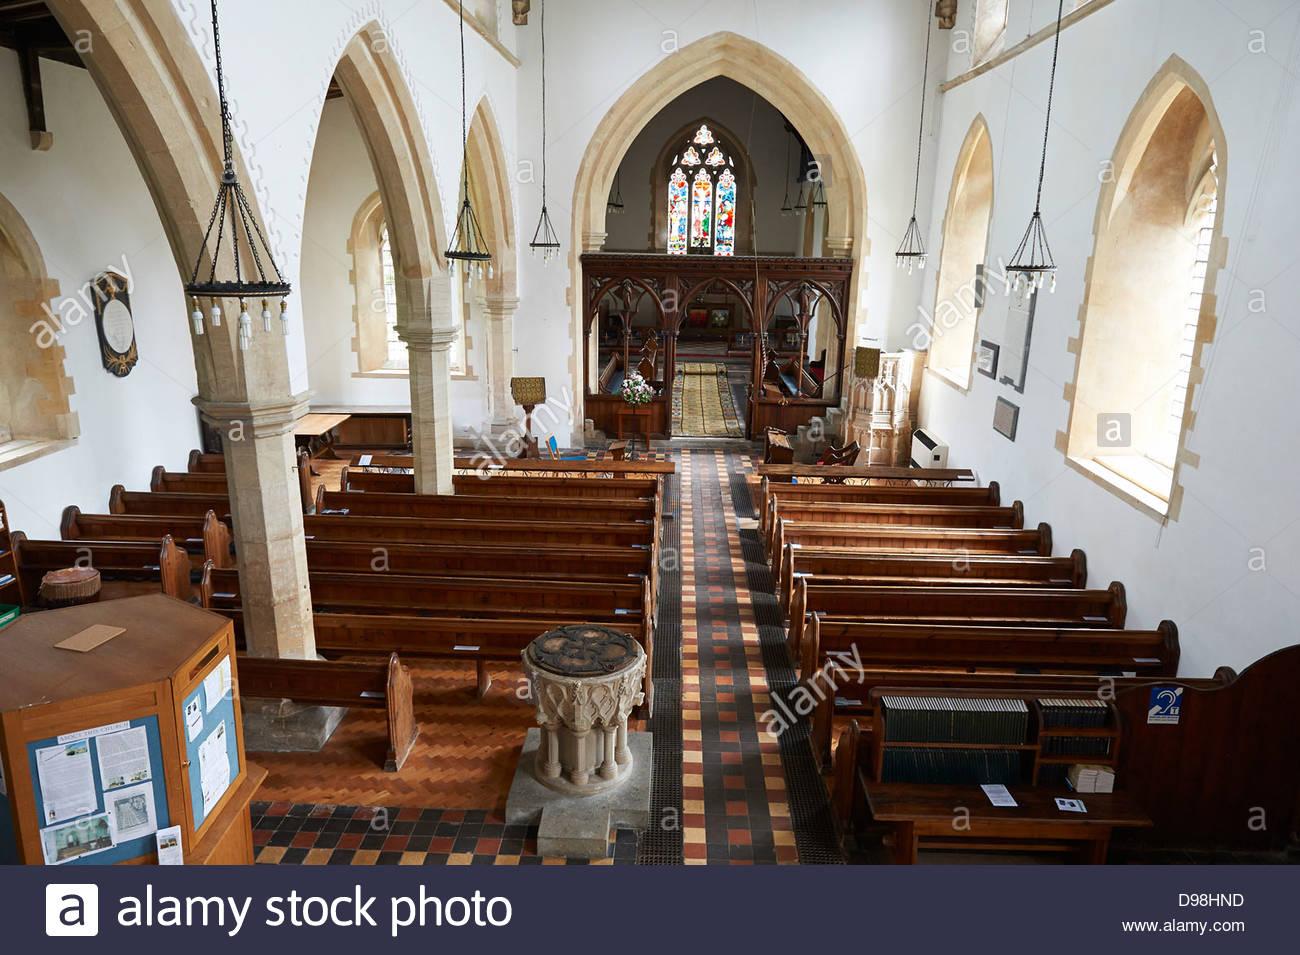 St Peter and St Paul Parish Church in Long Compton, Warwickshire UK - Stock Image